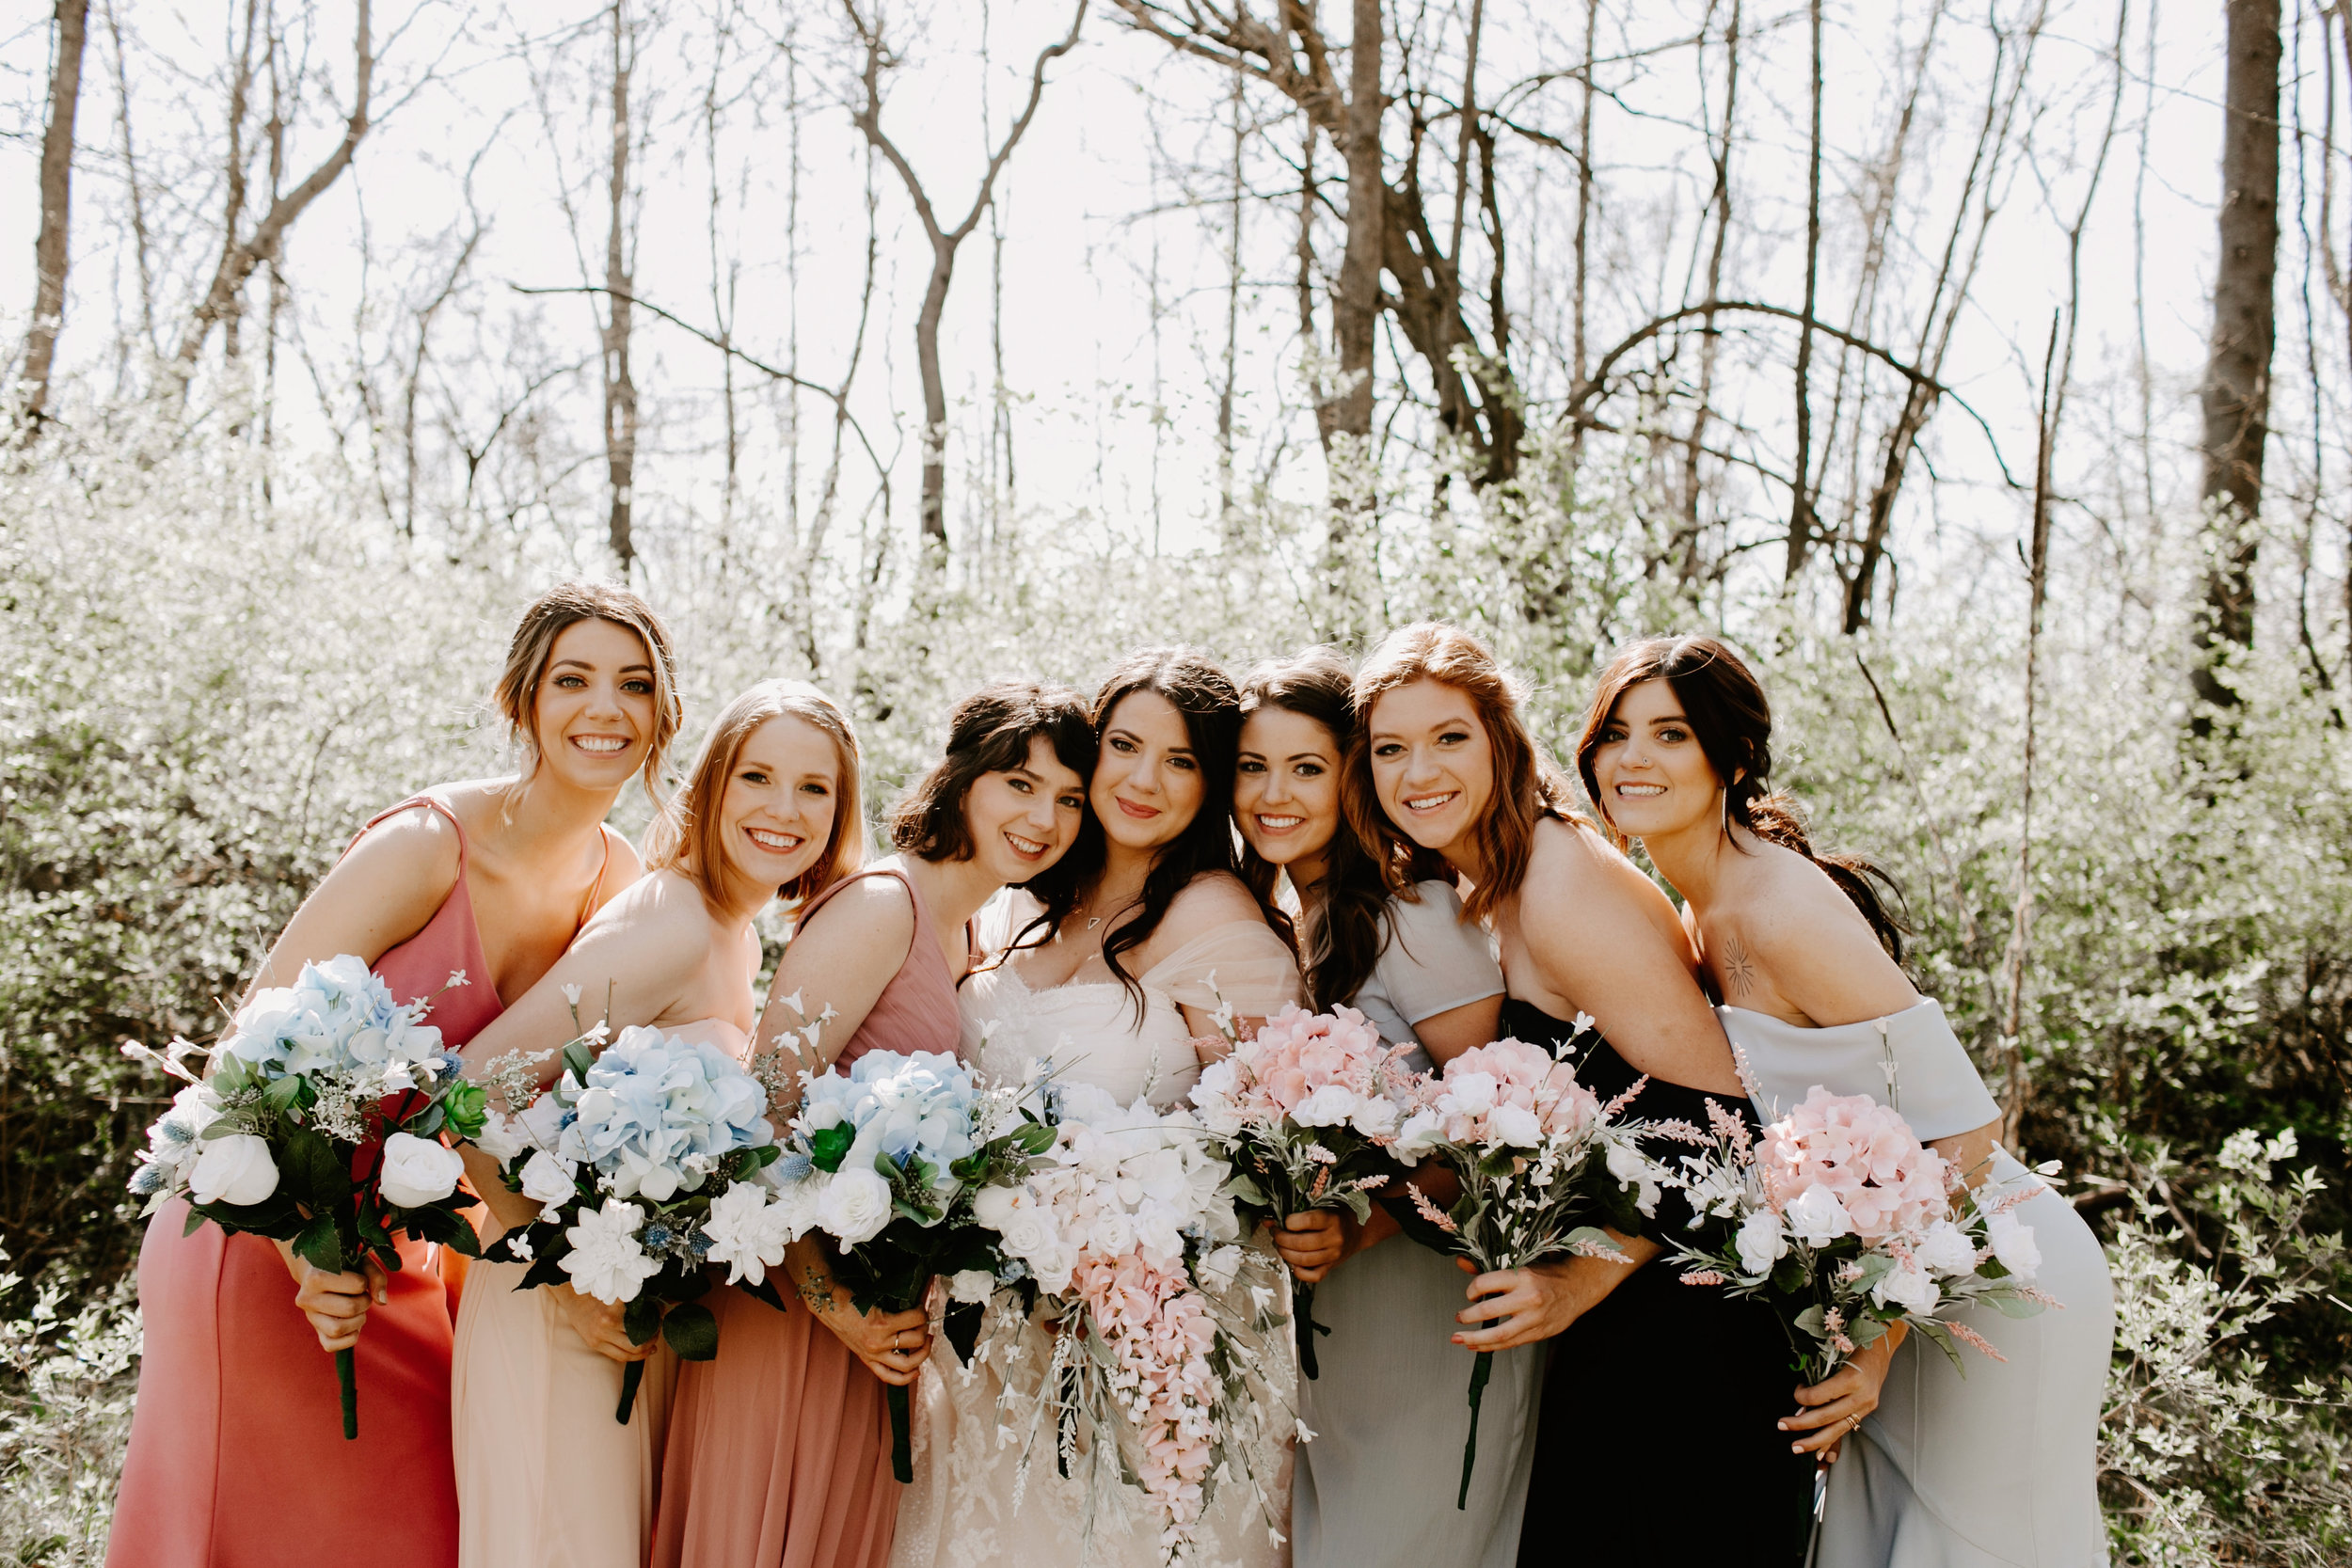 Grace Church Fishers Wedding Indiana Carli and Bryan Emily Elyse Wehner Photography LLC-174.jpg